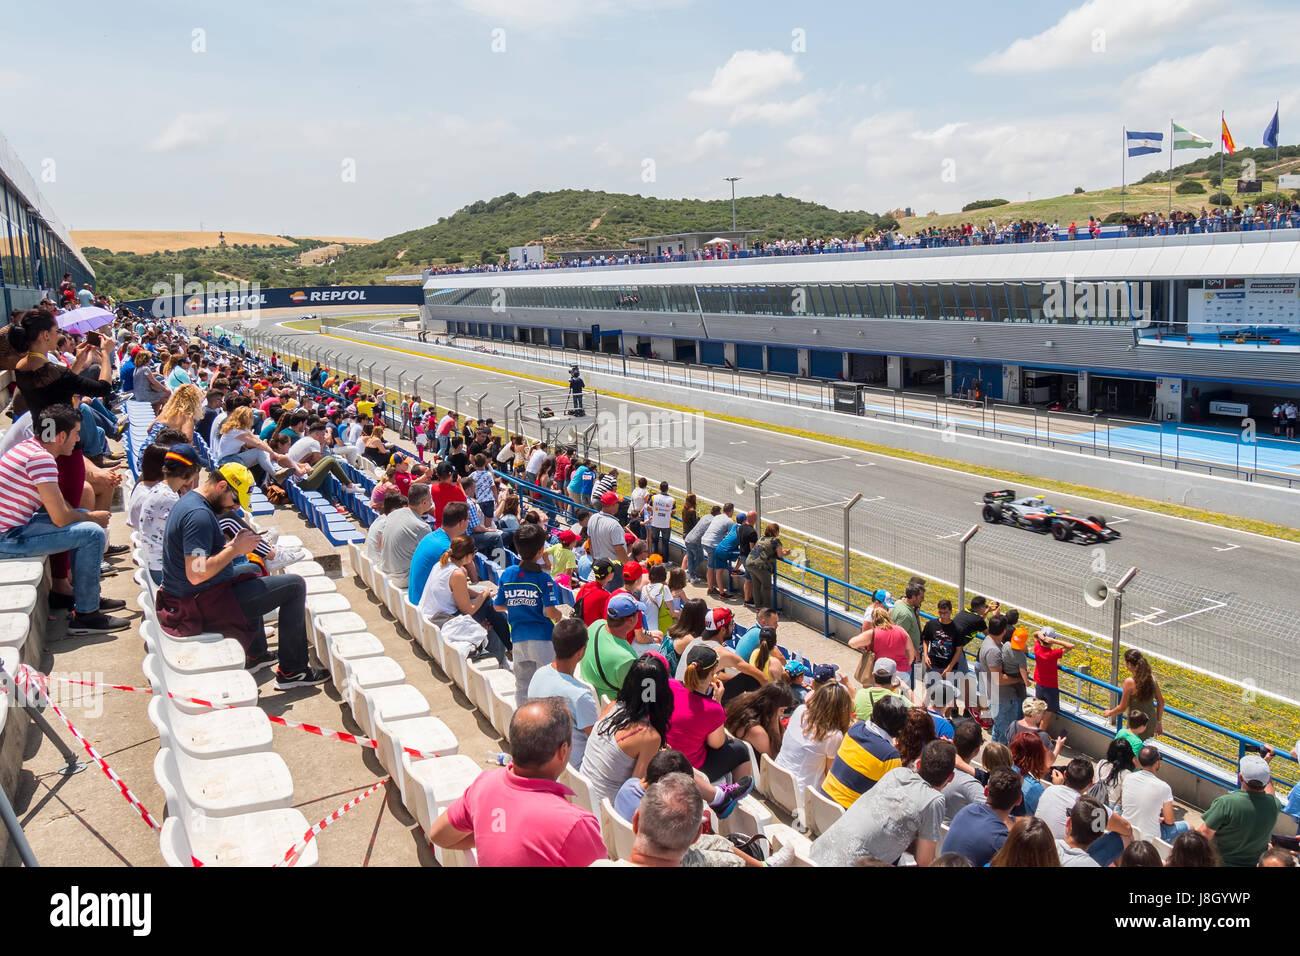 Circuito Jerez : Circuito de jerez diciembre la página de motor de jjmedina